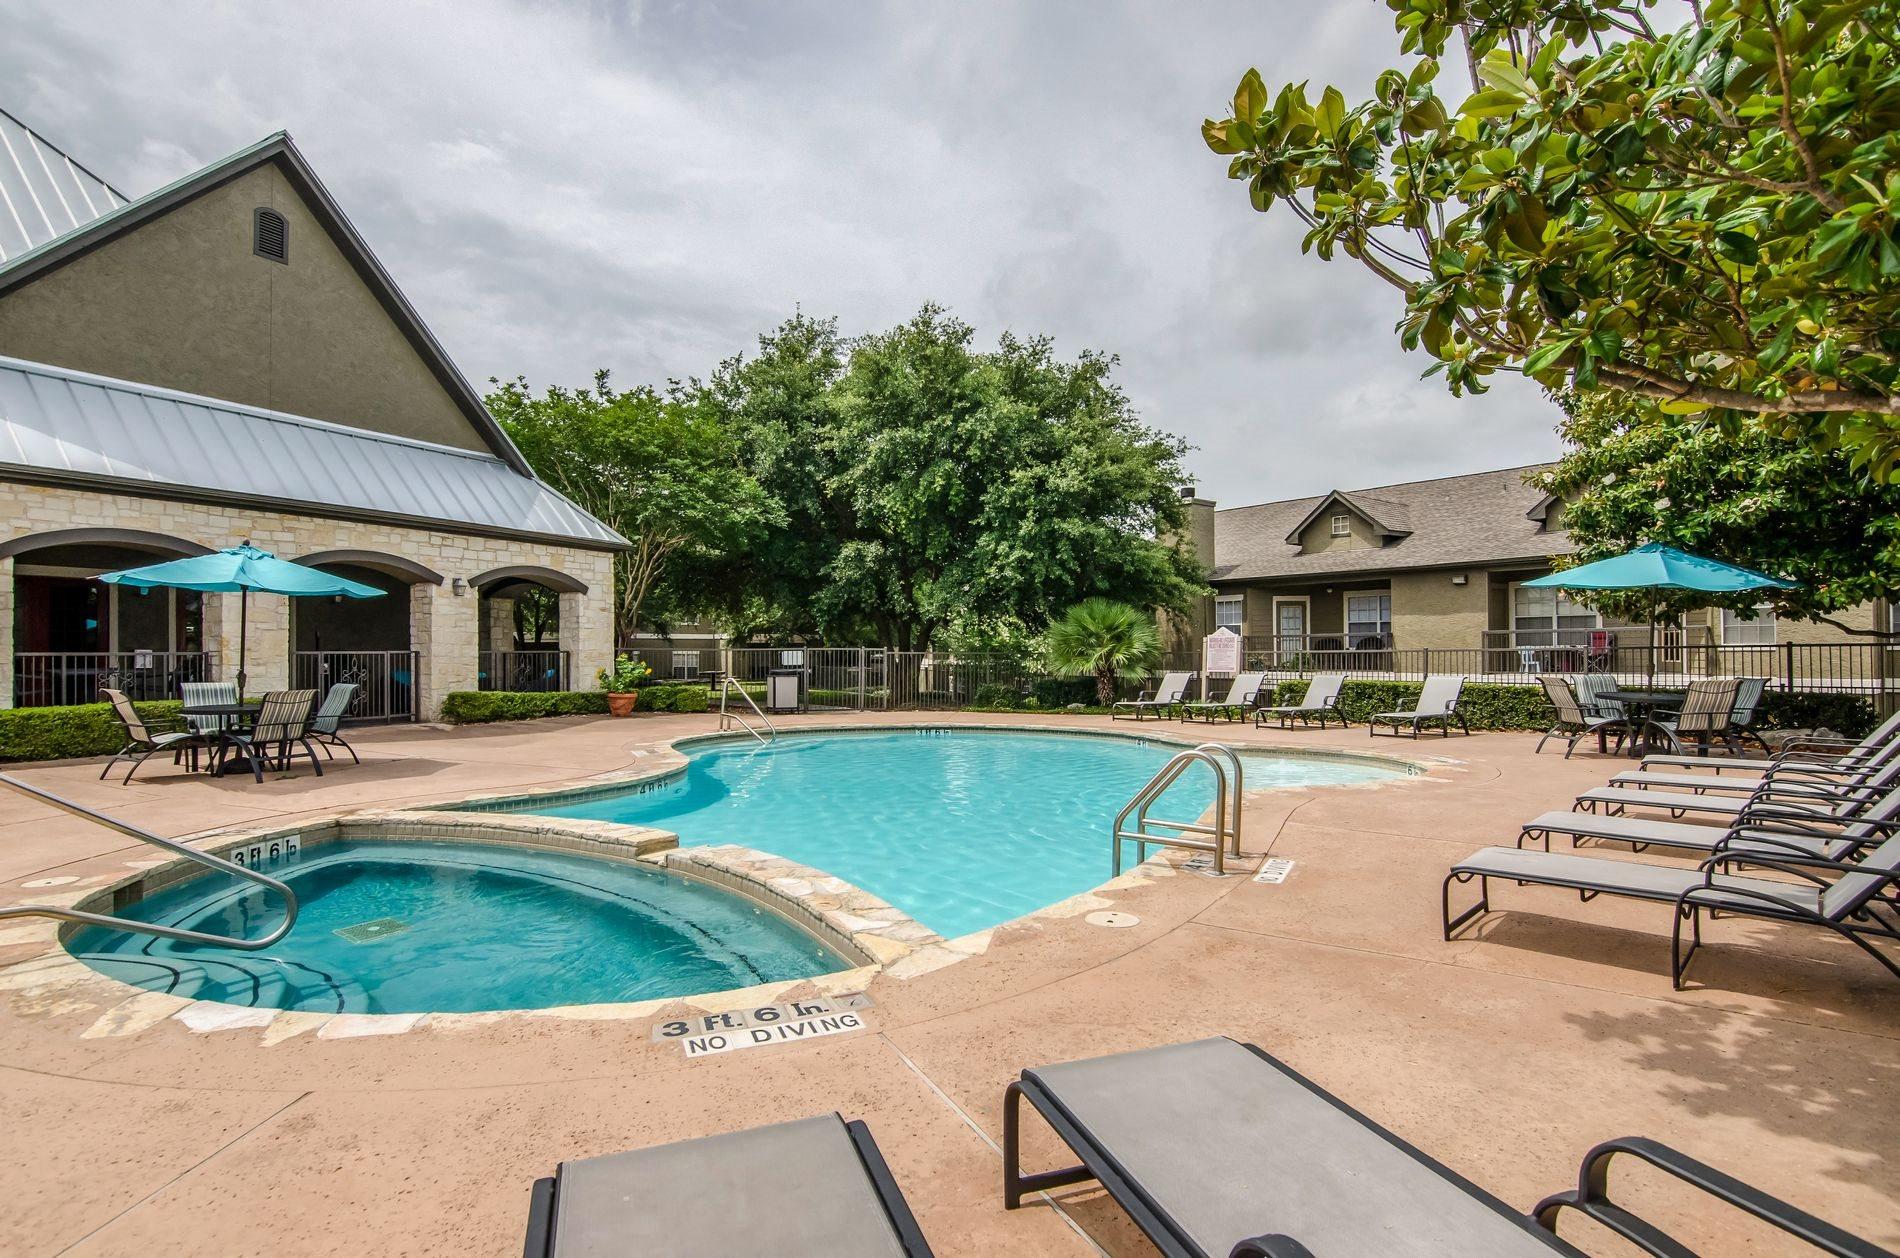 La mirage apartments in san antonio tx - Homes for sale with swimming pool el paso tx ...